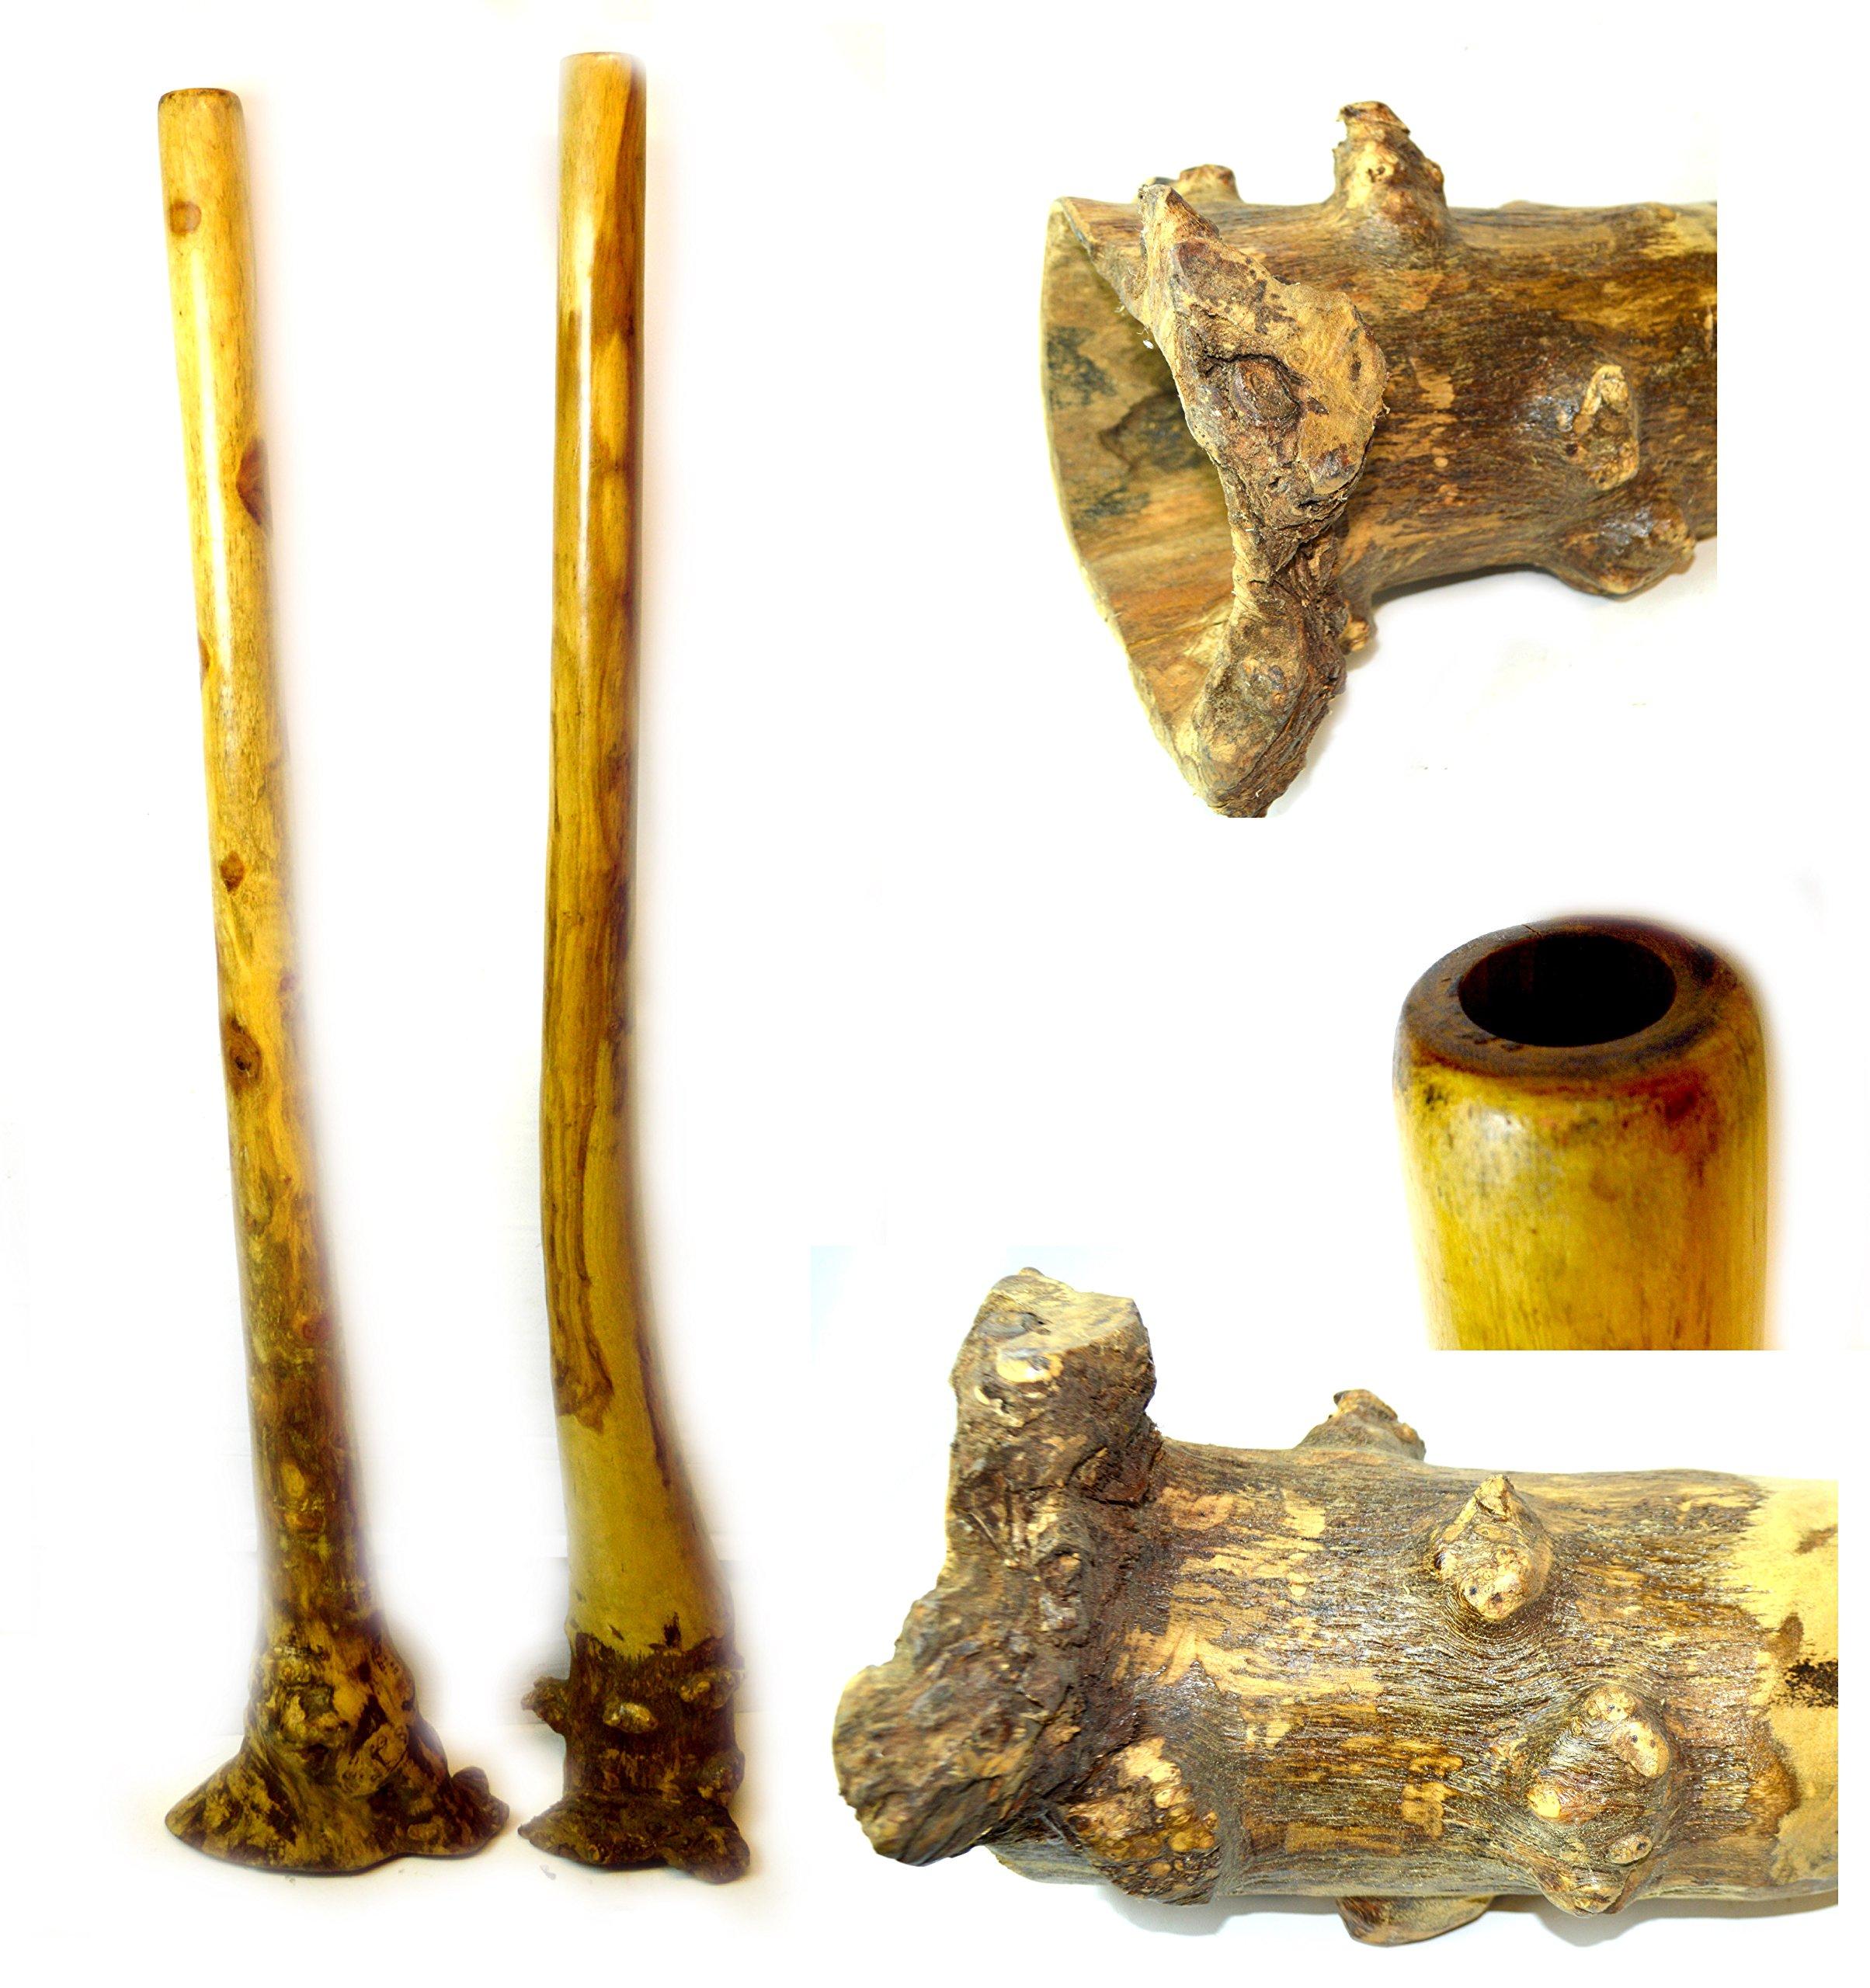 60'' Djembe Bongo Hand Carved Out of Eucalyptus African Didgeridoo Didjeridu Aboriginal Dot Art Design *One for Sale*